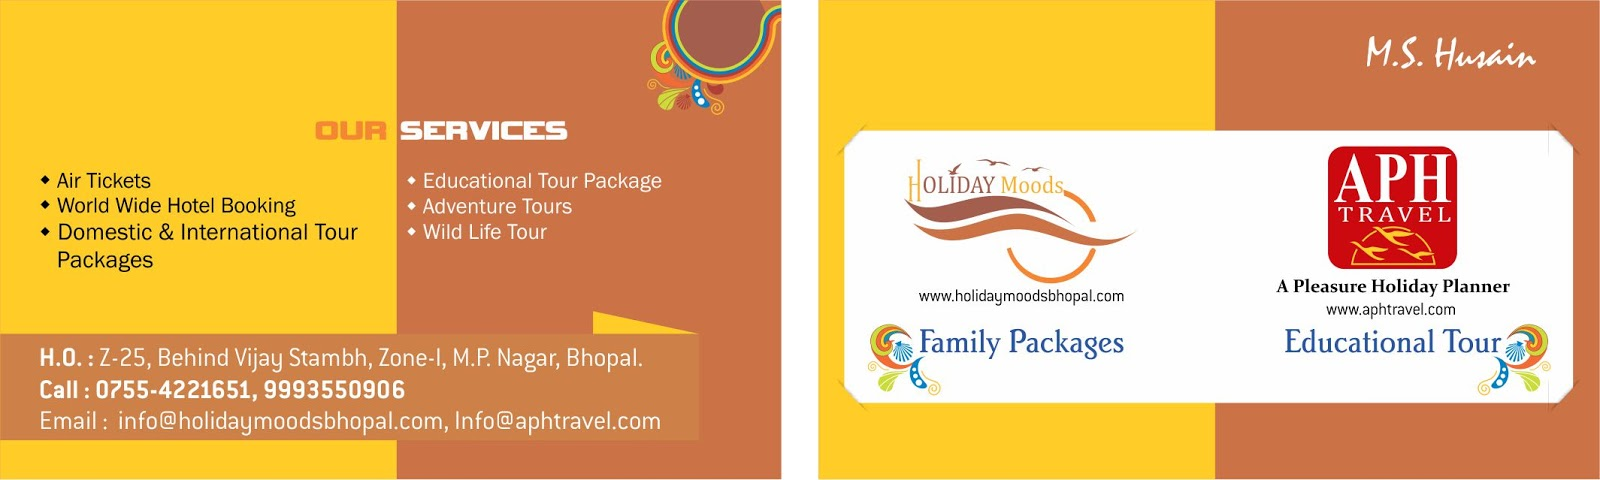 Bhagat Graphic Designer: aph travels vcard design